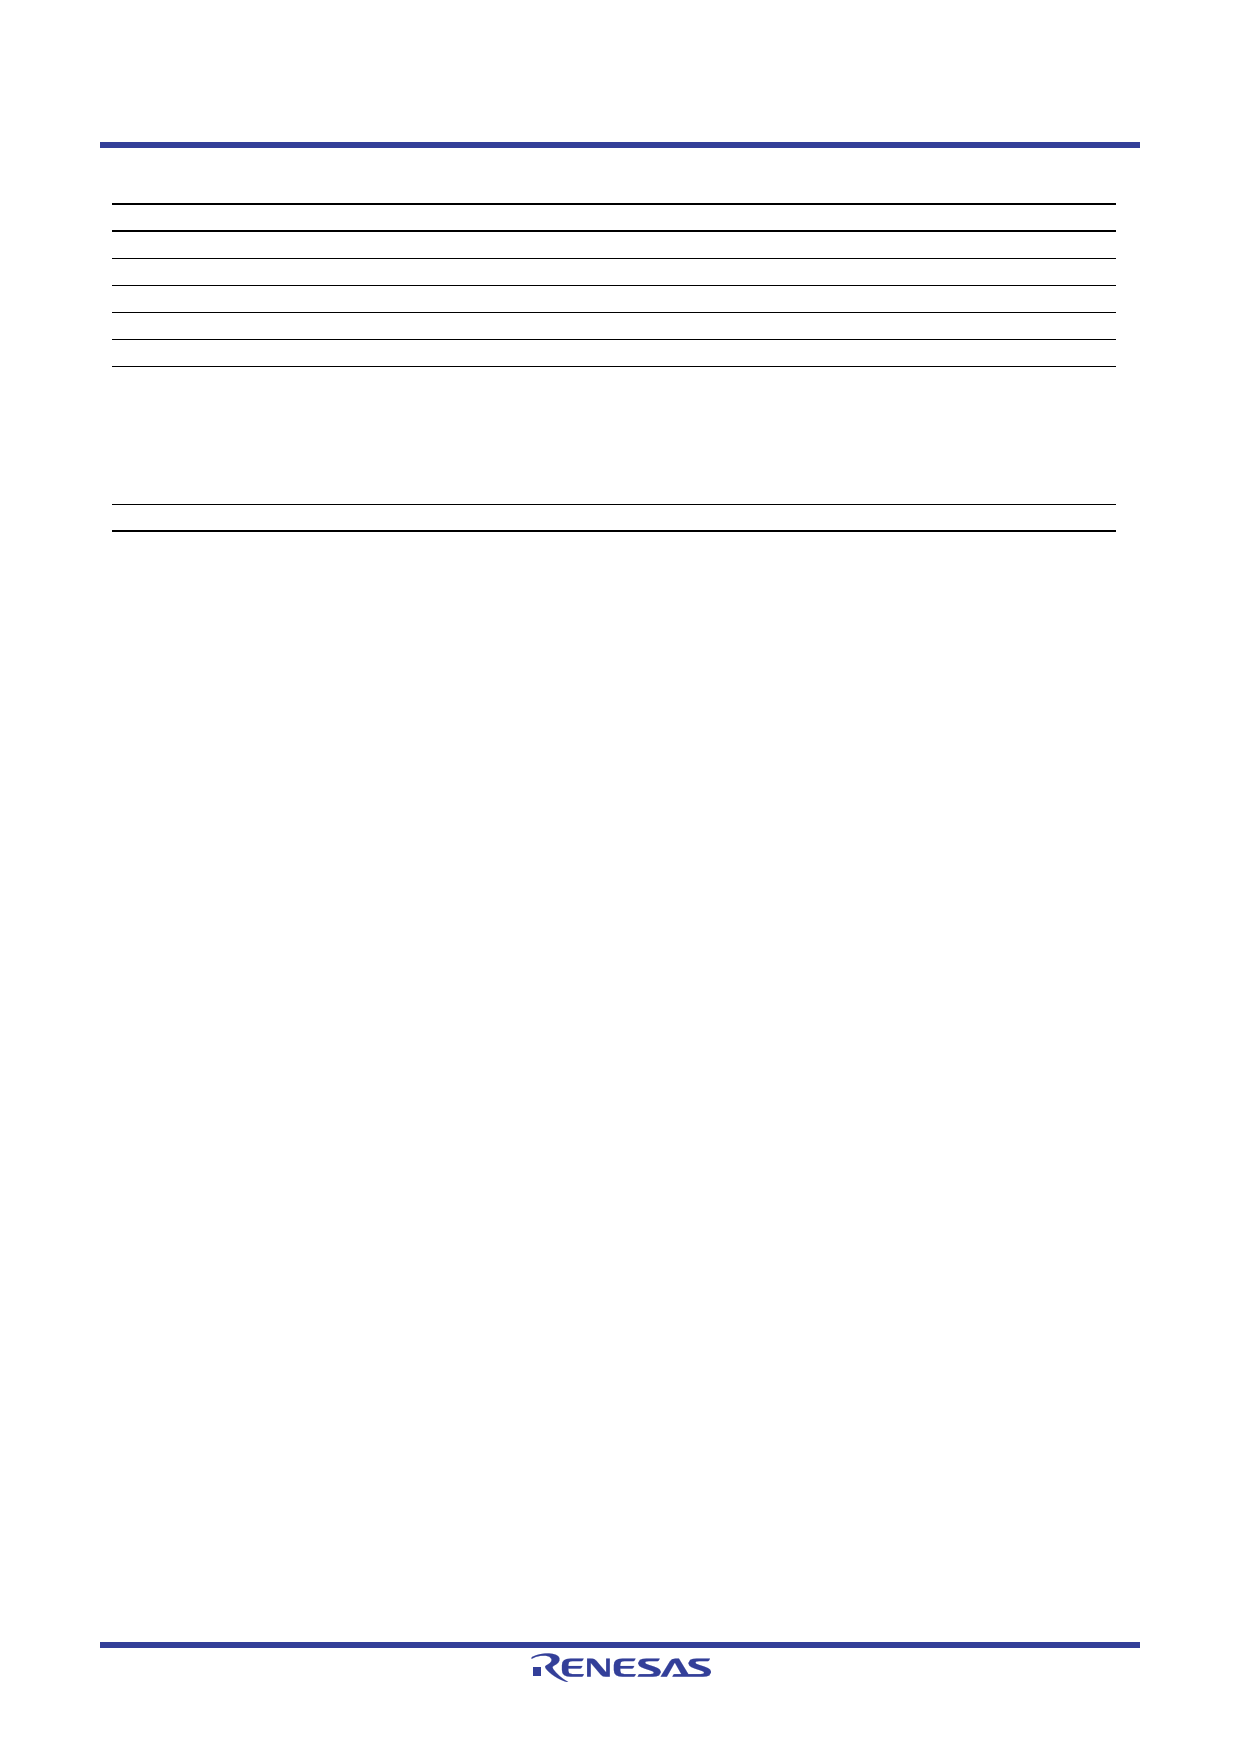 R5F51101AGFM pdf, 반도체, 판매, 대치품